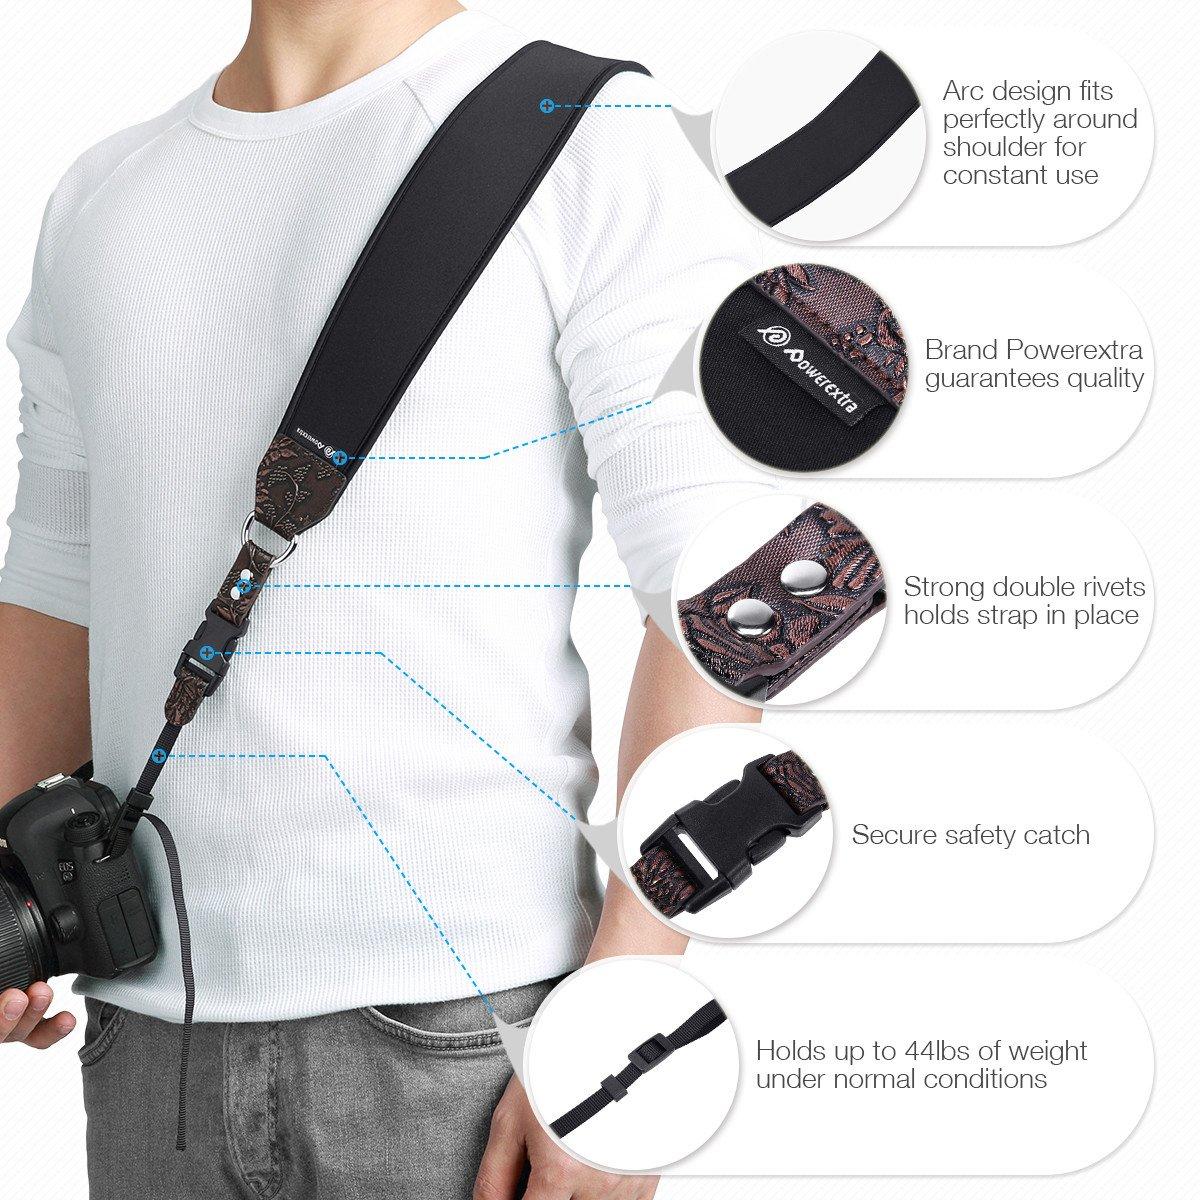 Powerextra カメラネックショルダーストラップとリストストラップ クイックリリースと安全テザー Nikon Sony Olympus Pentax 富士フィルム パナソニック キヤノン カメラ SLR デジタル一眼レフカメラ用 B07GP8MWJT